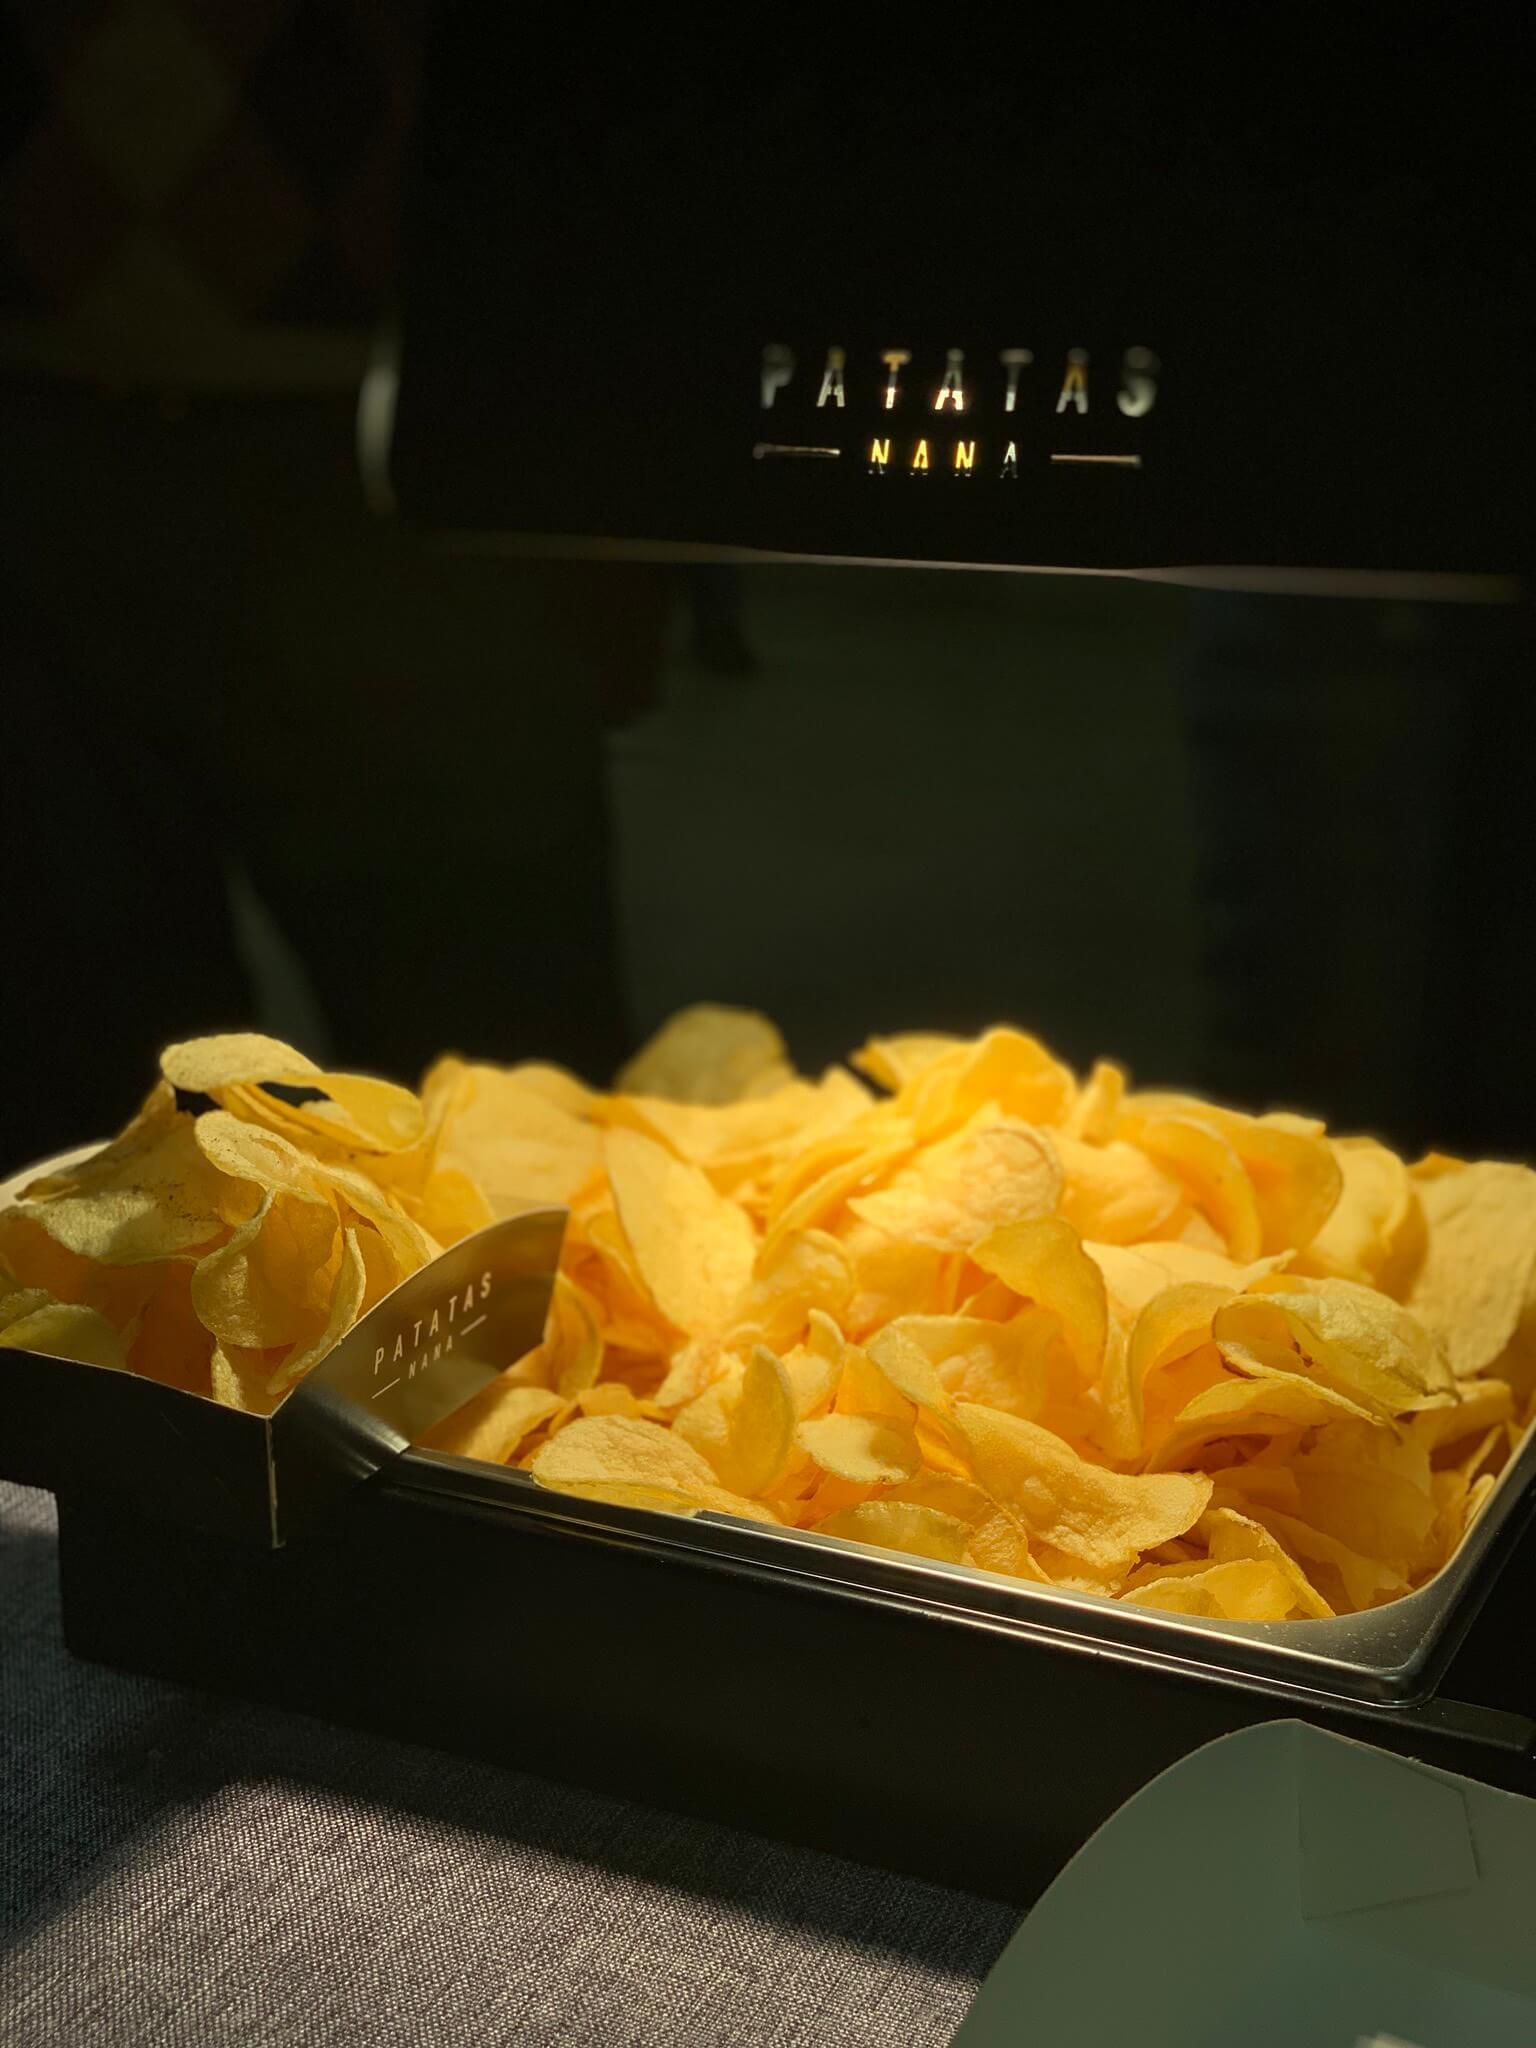 lampada-chips-patatas-nana